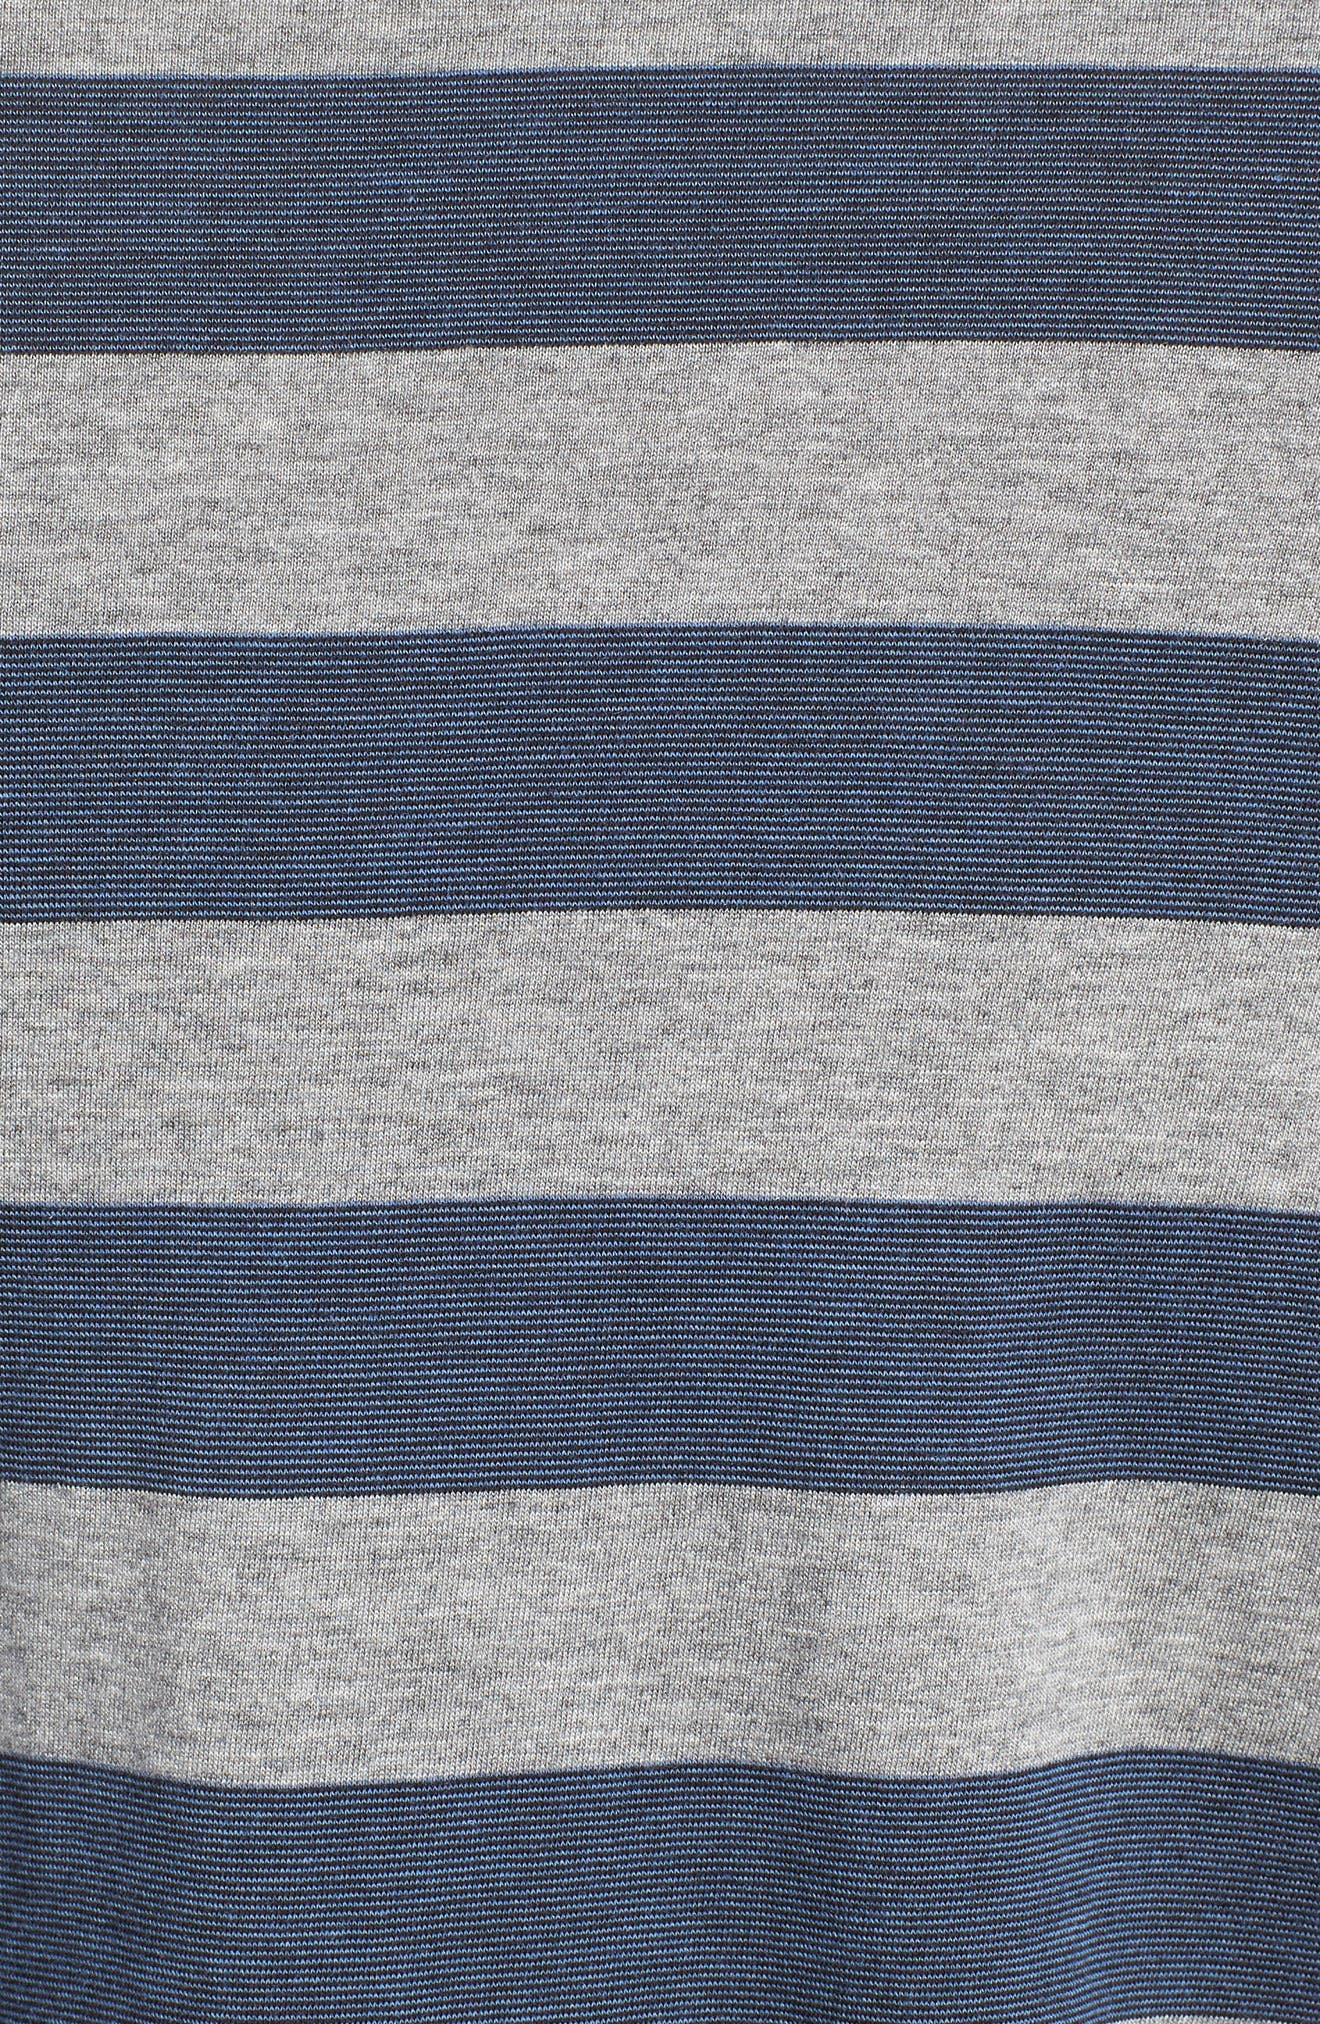 Alternate Image 5  - Daniel Buchler Stripe Pima Cotton & Modal V-Neck T-Shirt